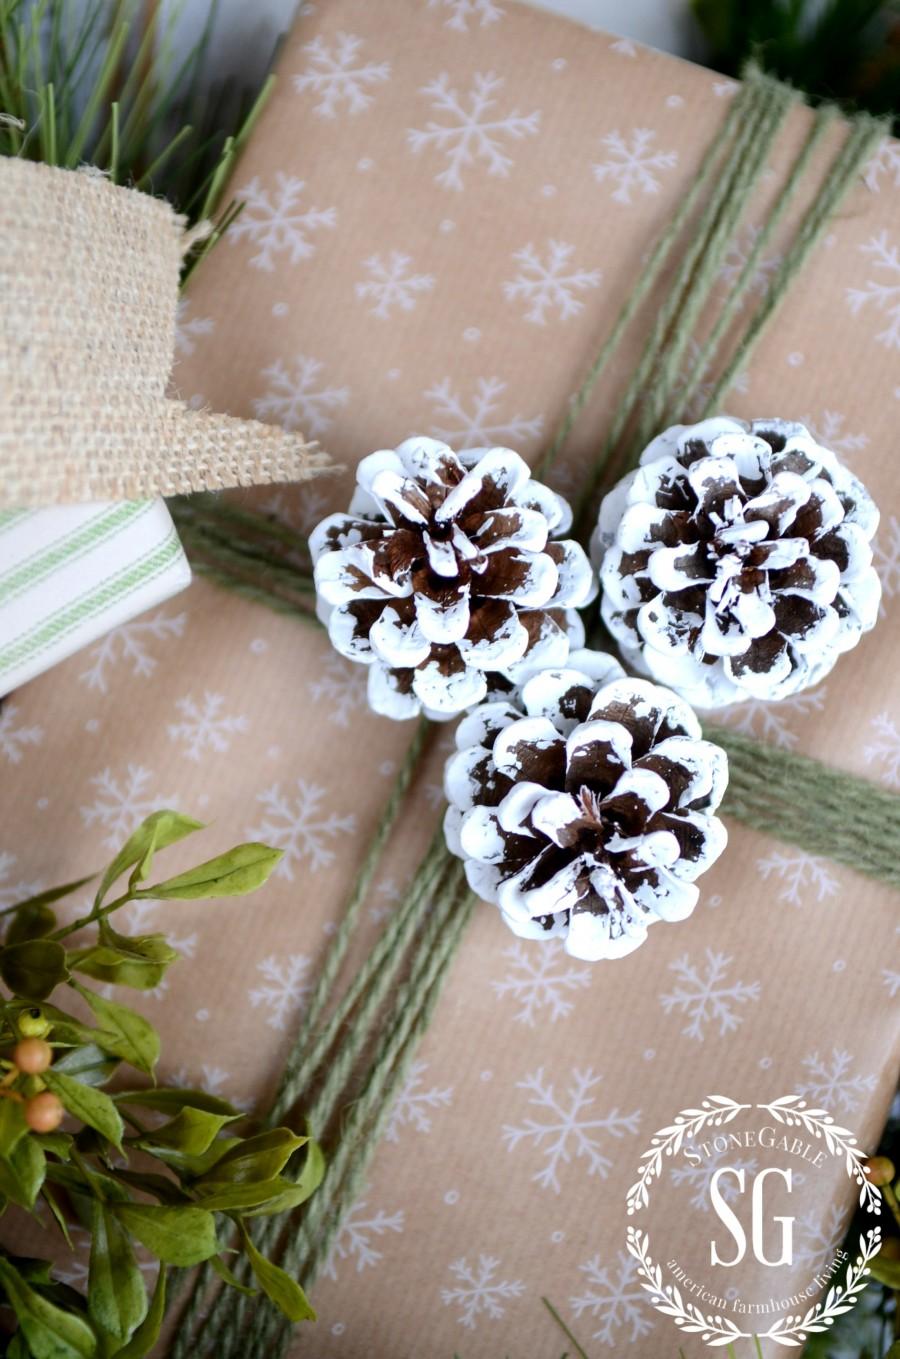 CHRISTMAS GIFT WRAP-gift with snowy pinecones-stonegableblog.com